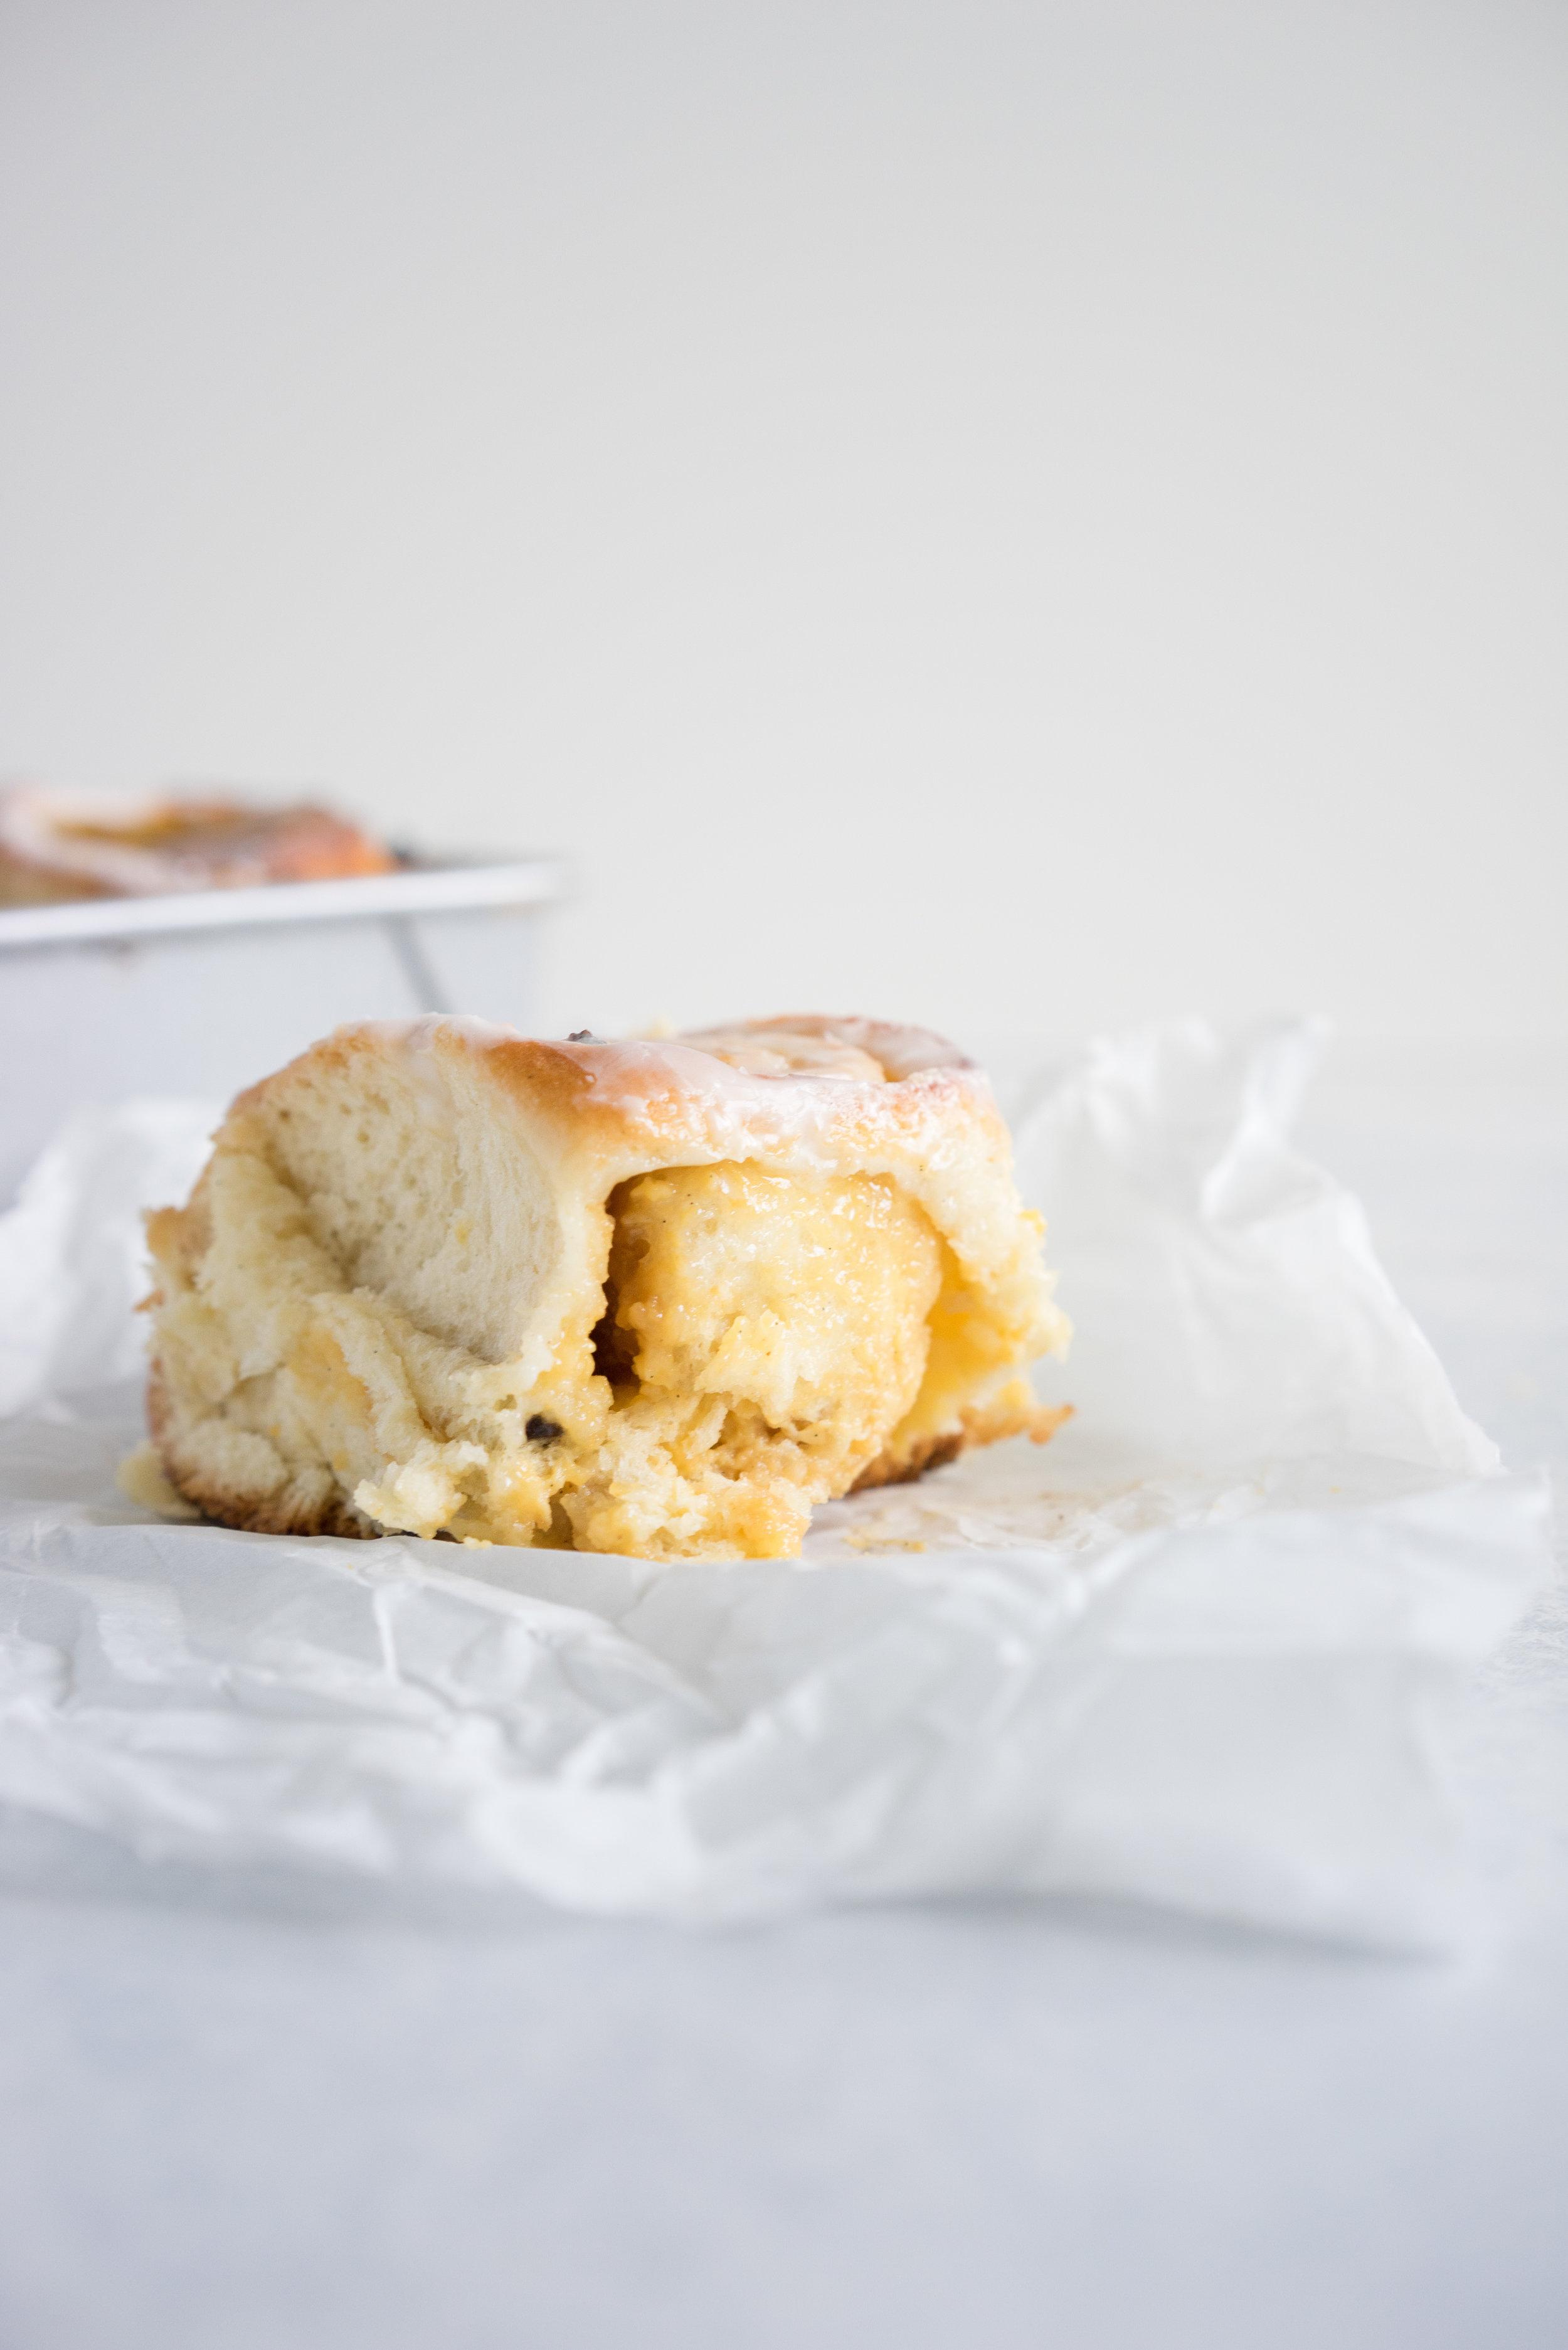 Chelsea buns (custard and raisin brioche buns), by Cloudy Kitchen. Fluffy brioche filled with a vanilla custard and raisins. An amazing riff on the traditional cinnamon bun. #chelseabun #custardbun #custardandraisin #brioche #vanillafrosting #custardscroll